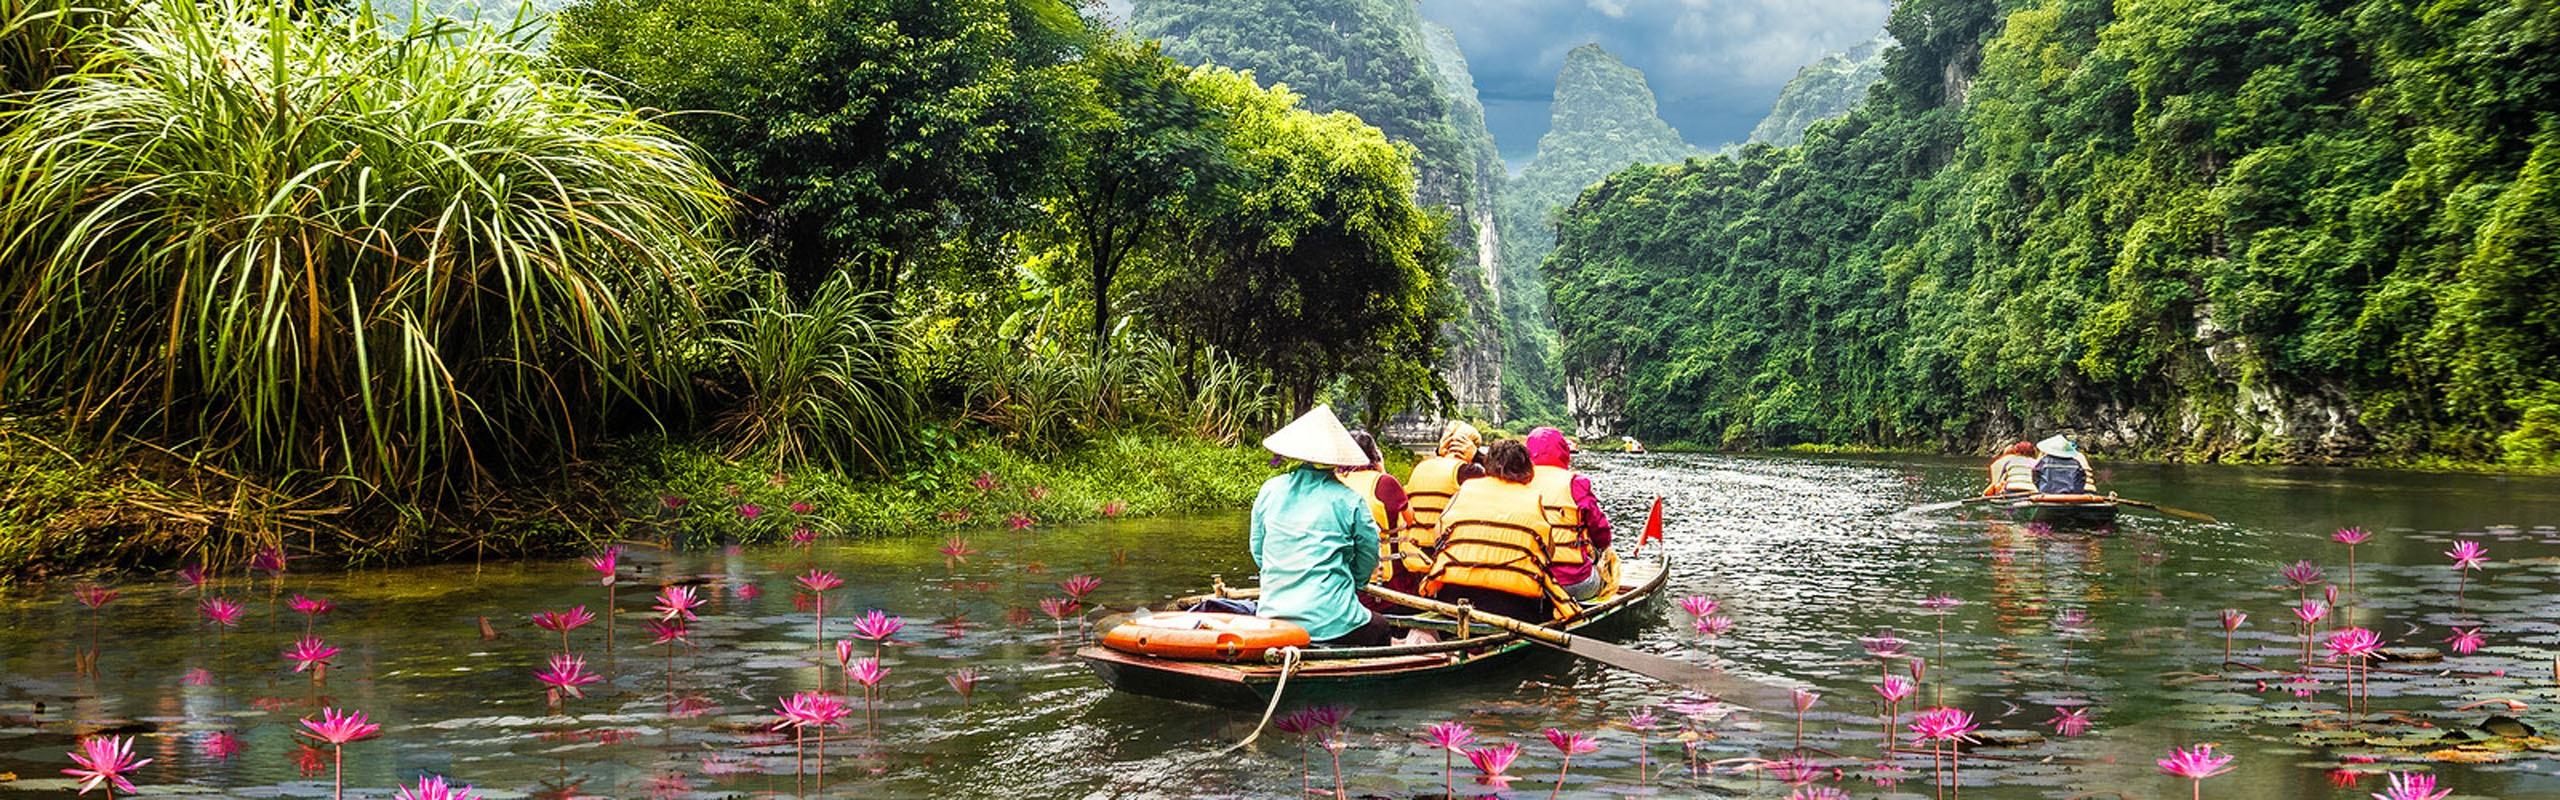 How to Enter Vietnam - International Flights into Vietnam